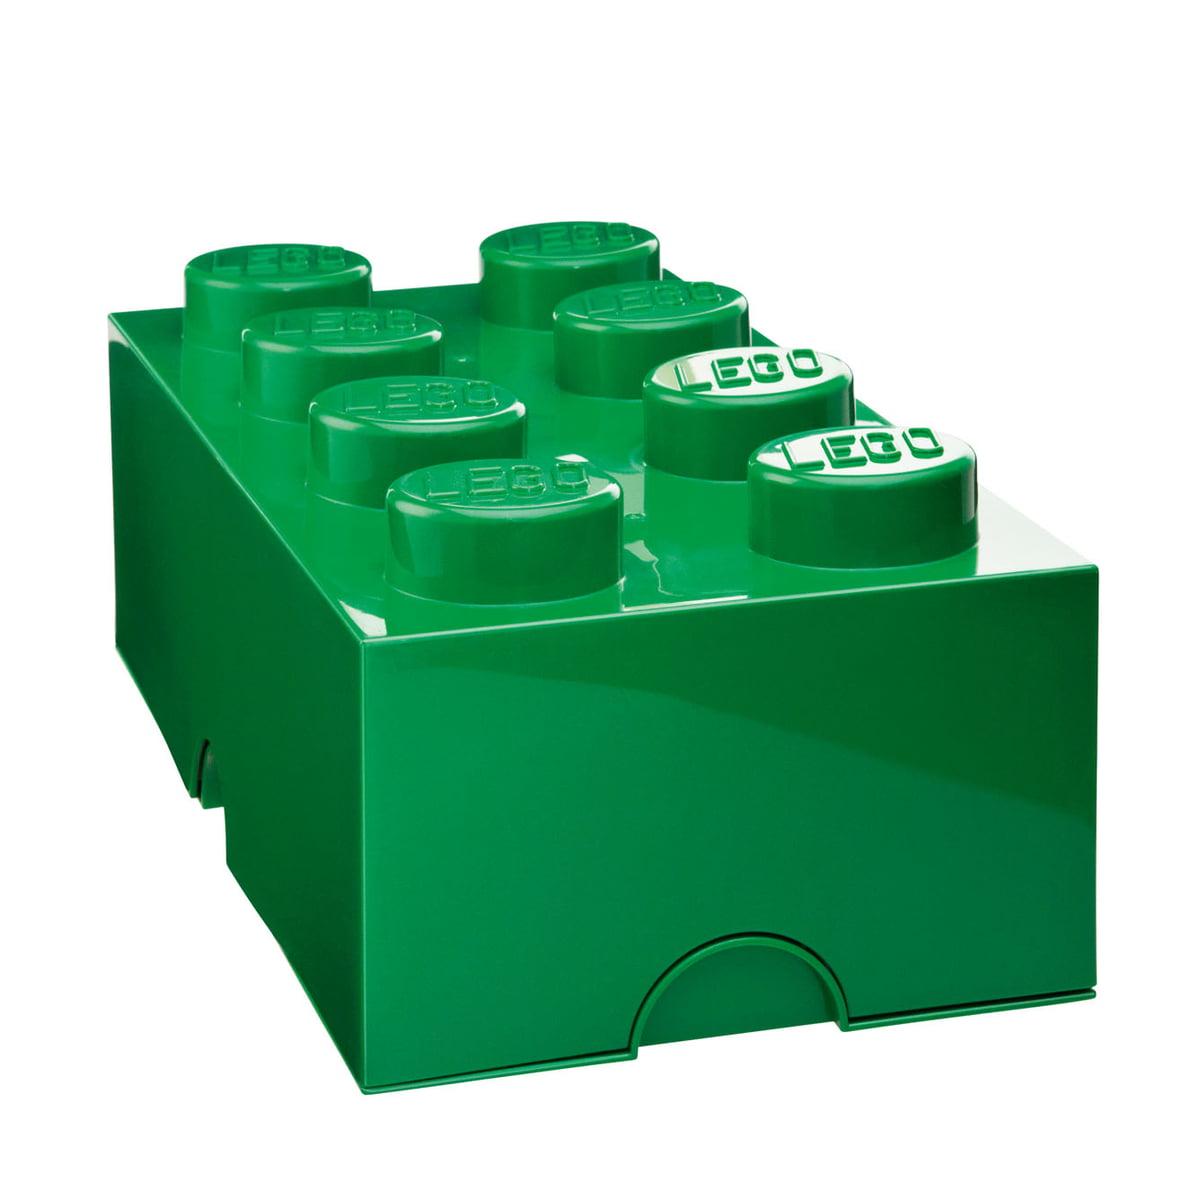 Lego - Storage Brick 8, dunkelgrün   Kinderzimmer   Dunkelgrün   Kunststoff   Lego